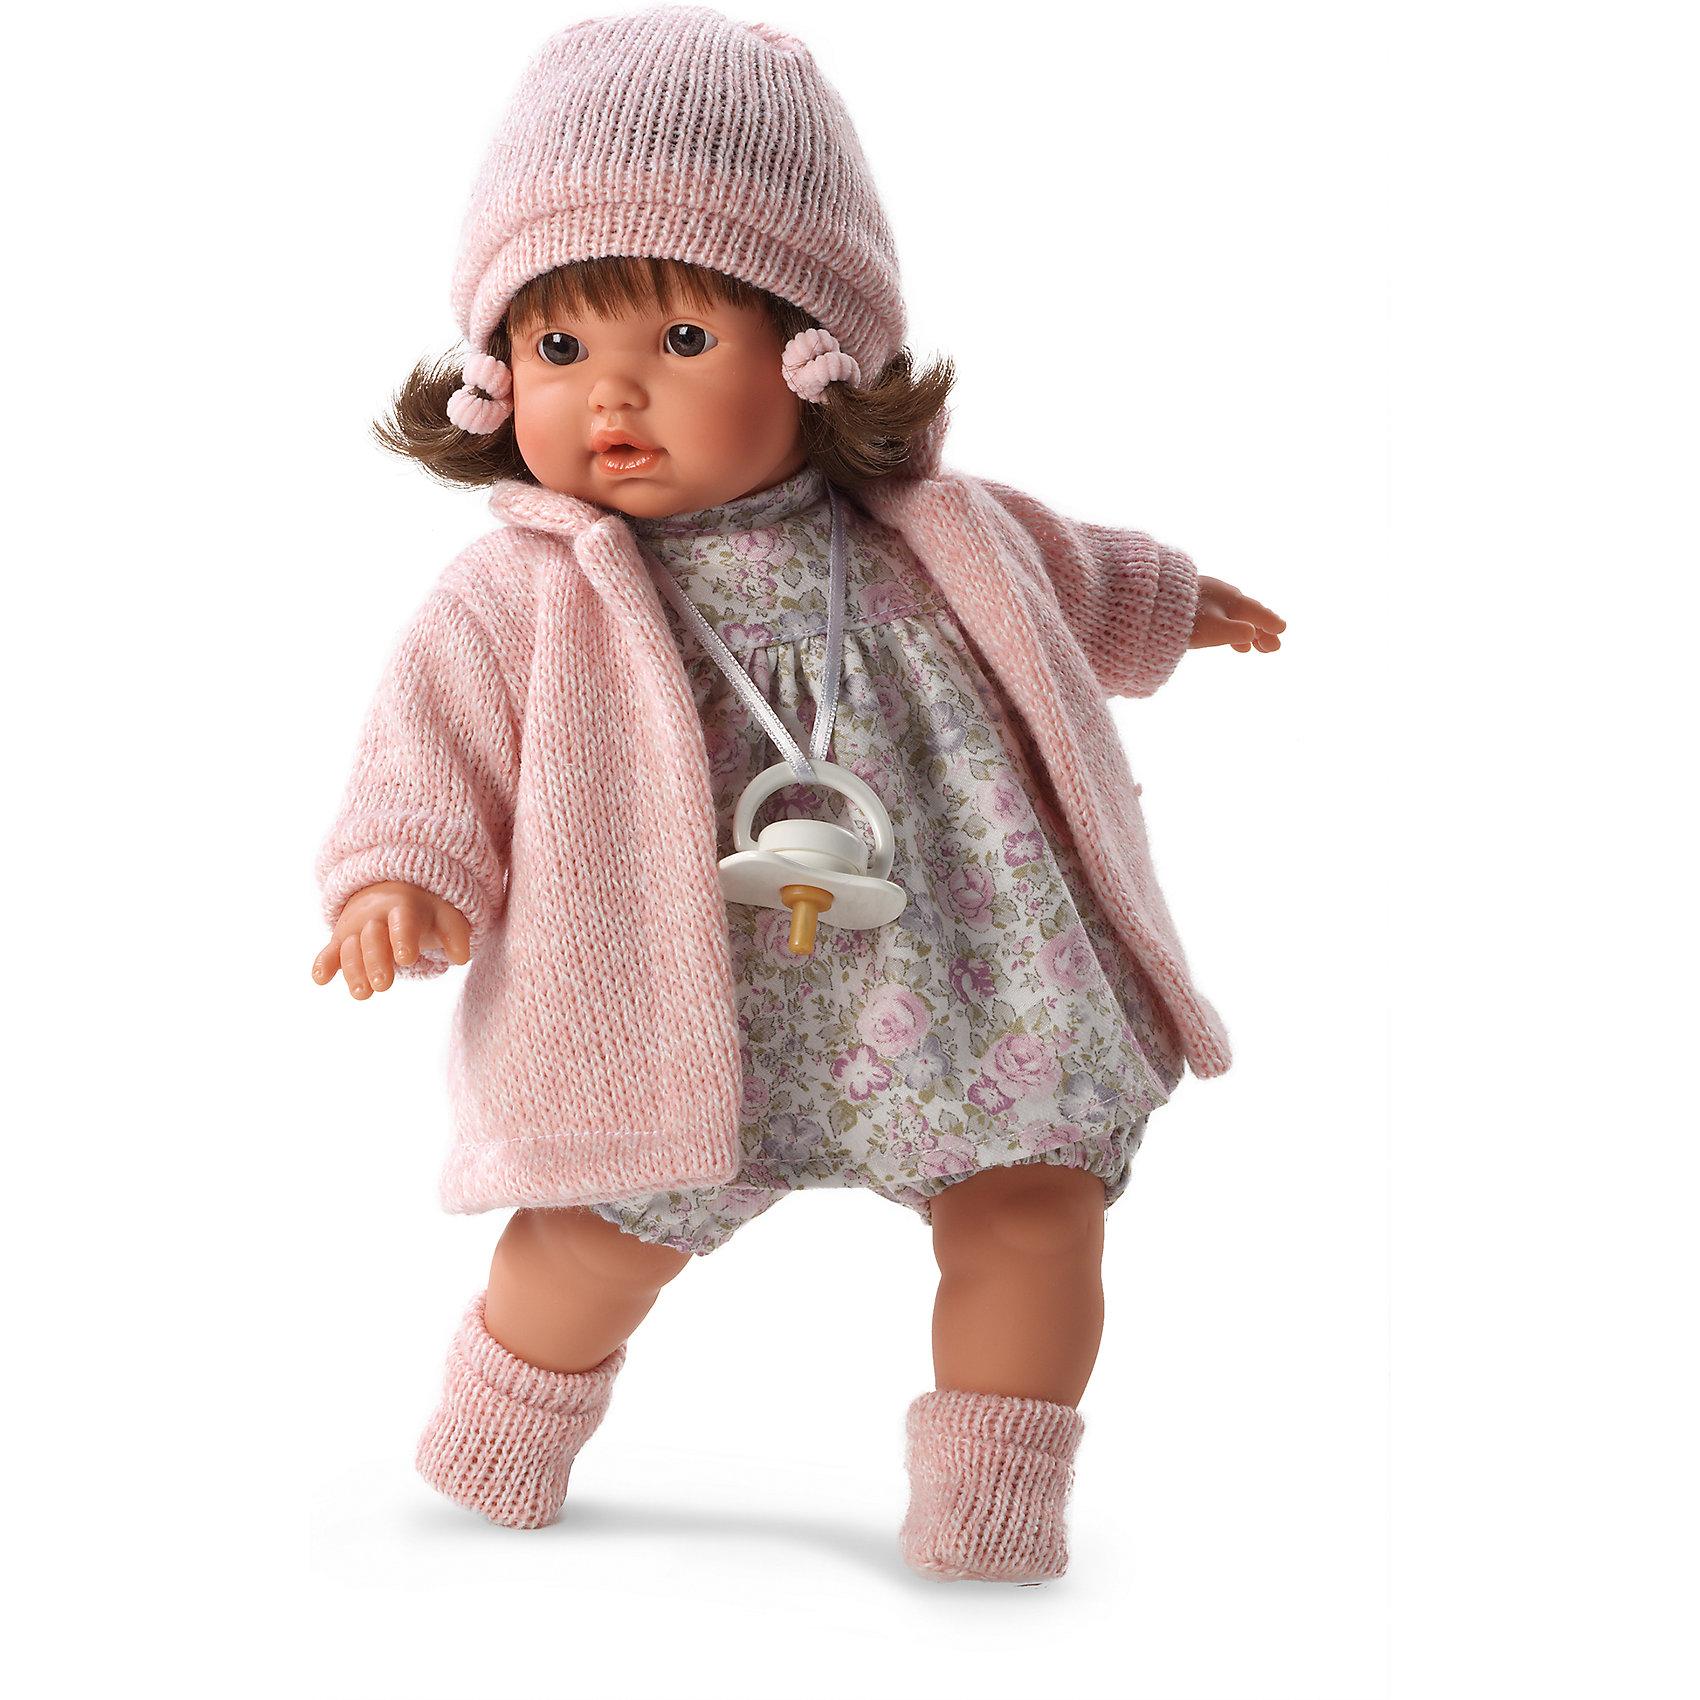 Llorens Кукла Айсель, 33 см, Llorens куклы и одежда для кукол llorens кукла алиса 33 см со звуком